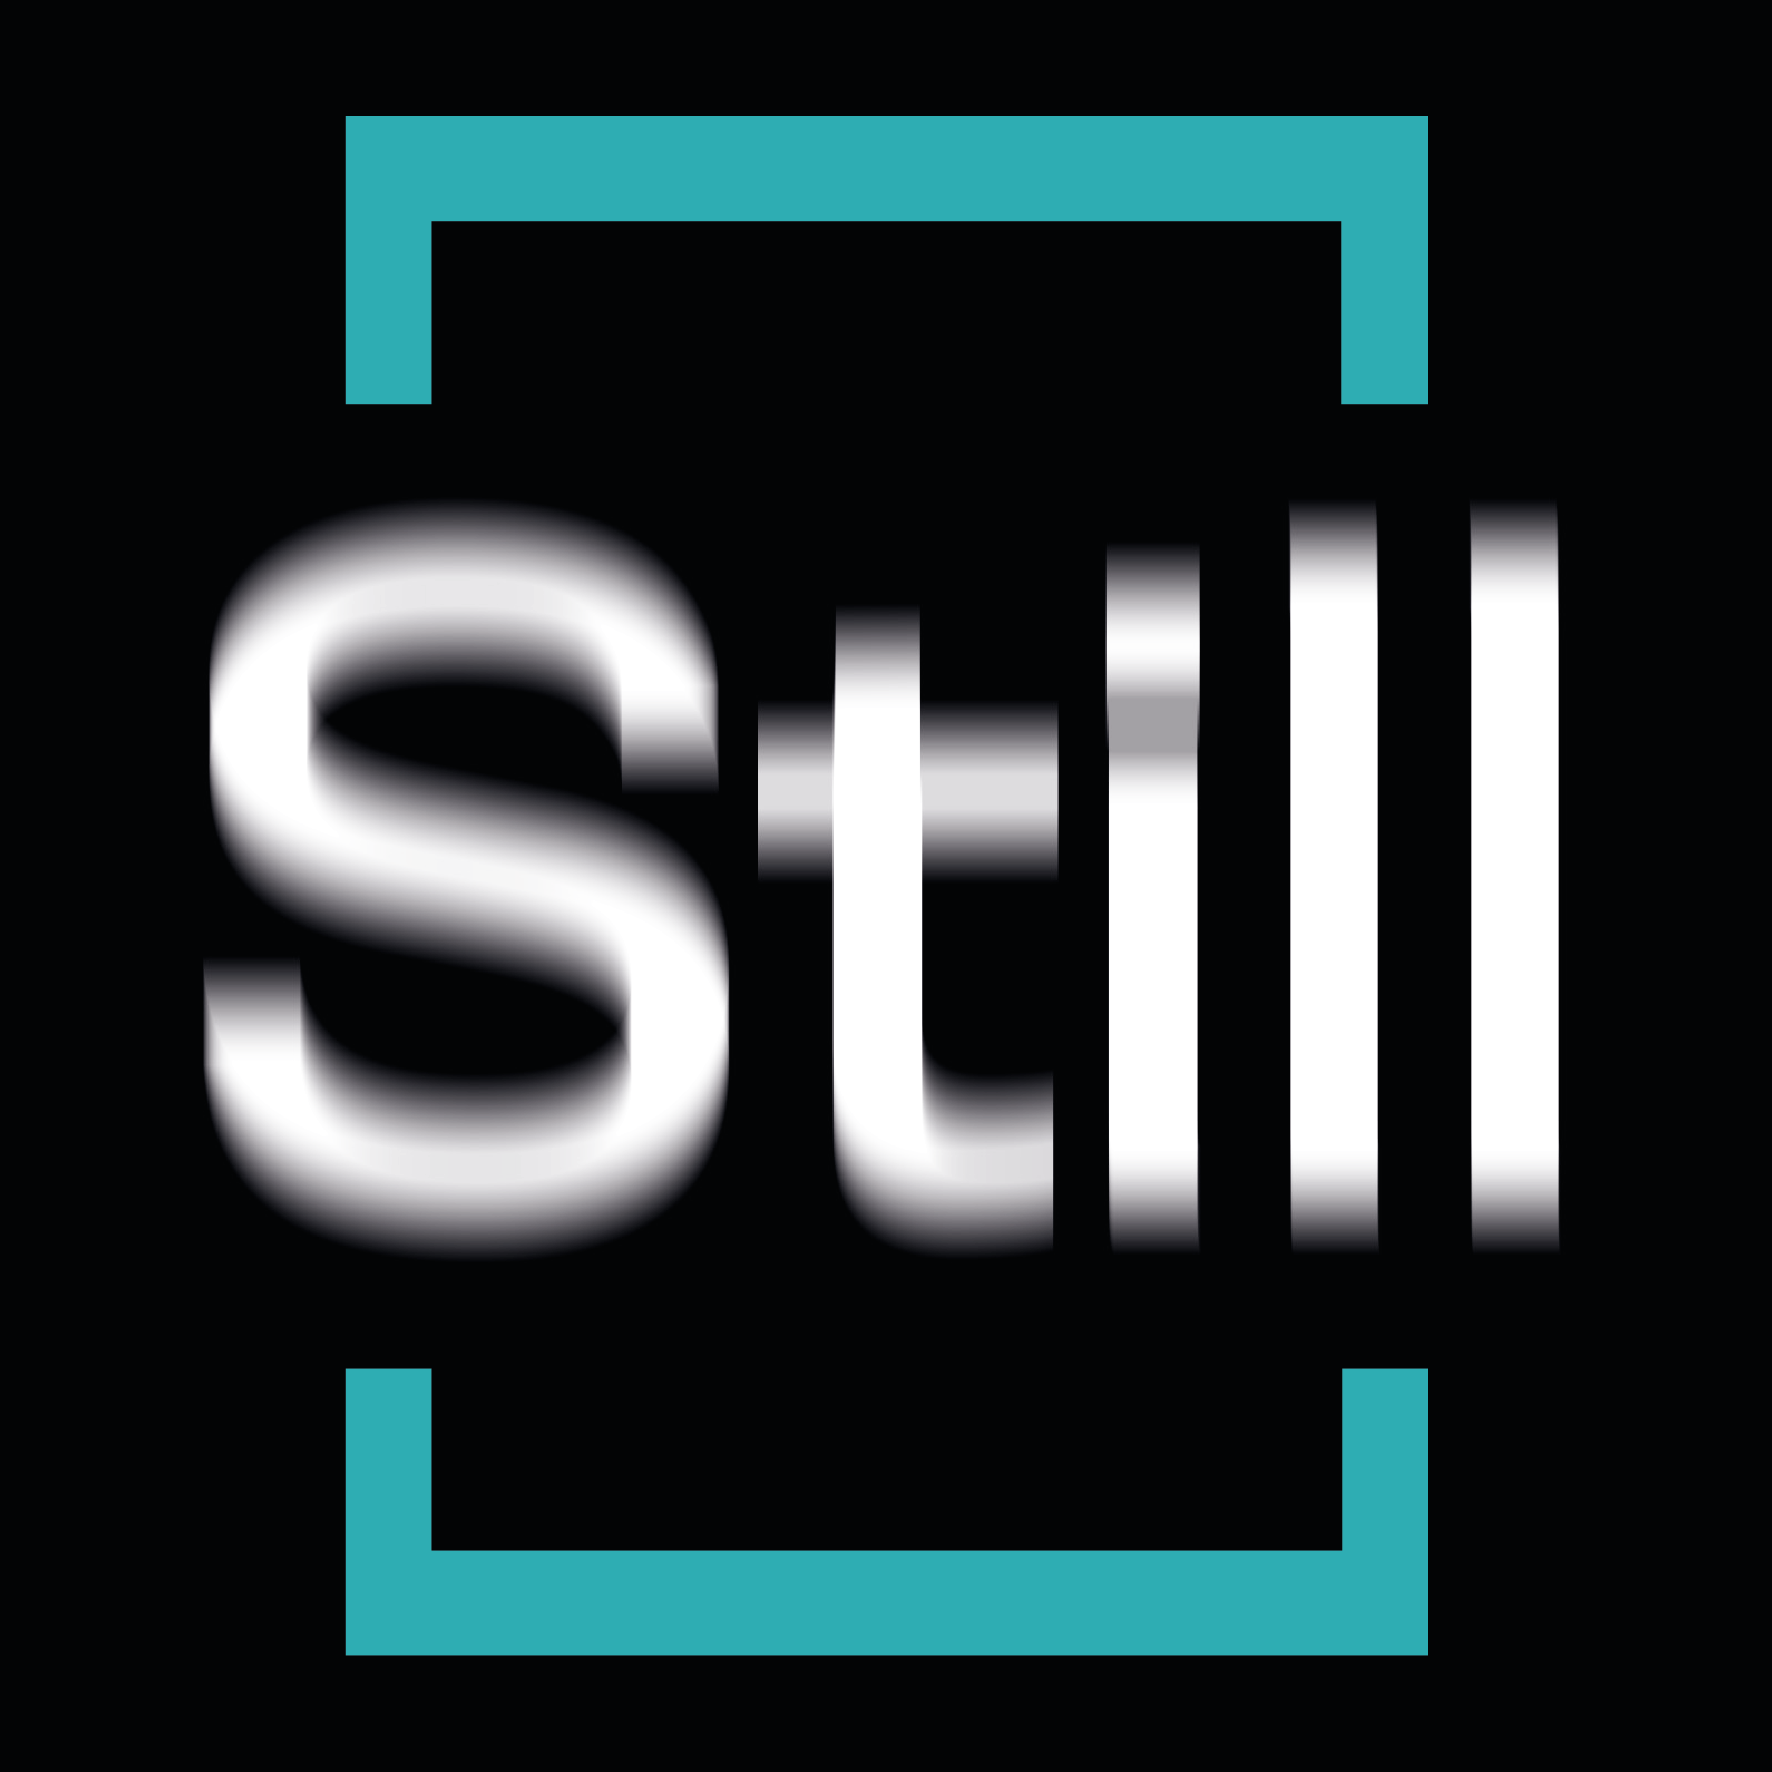 Rubenstelli_still_fotoacademie_logozwart